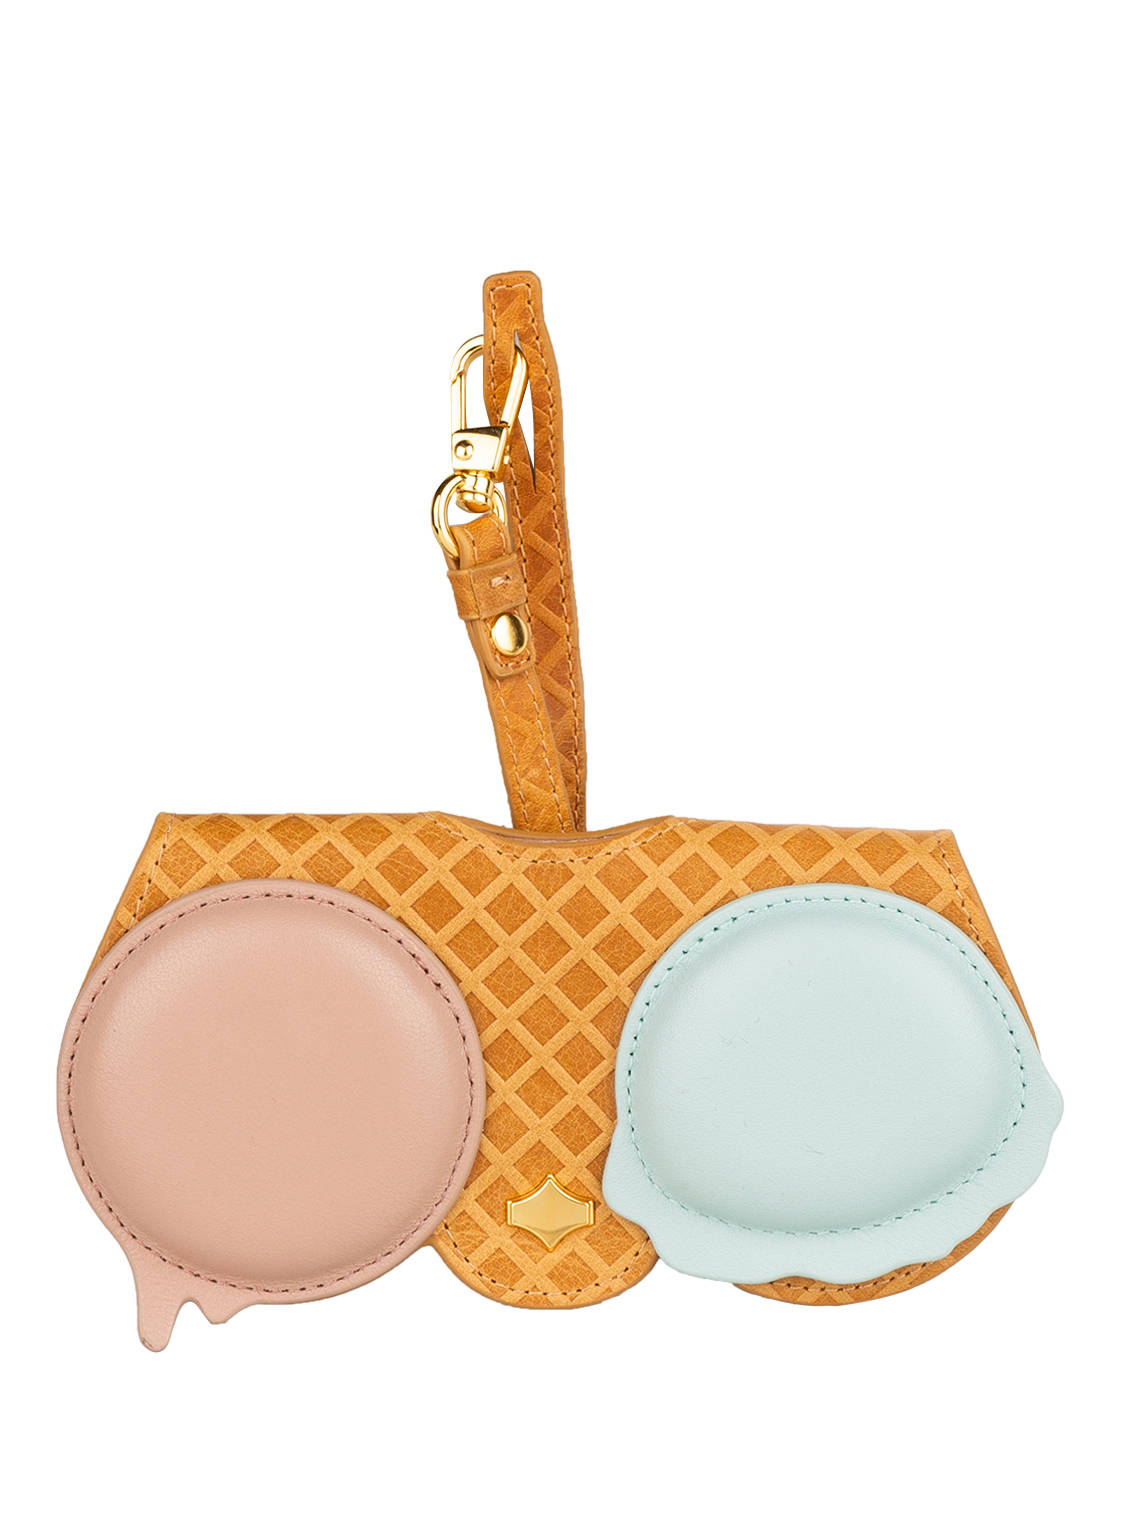 Image of Any Di Brillenetui Ice Cream braun